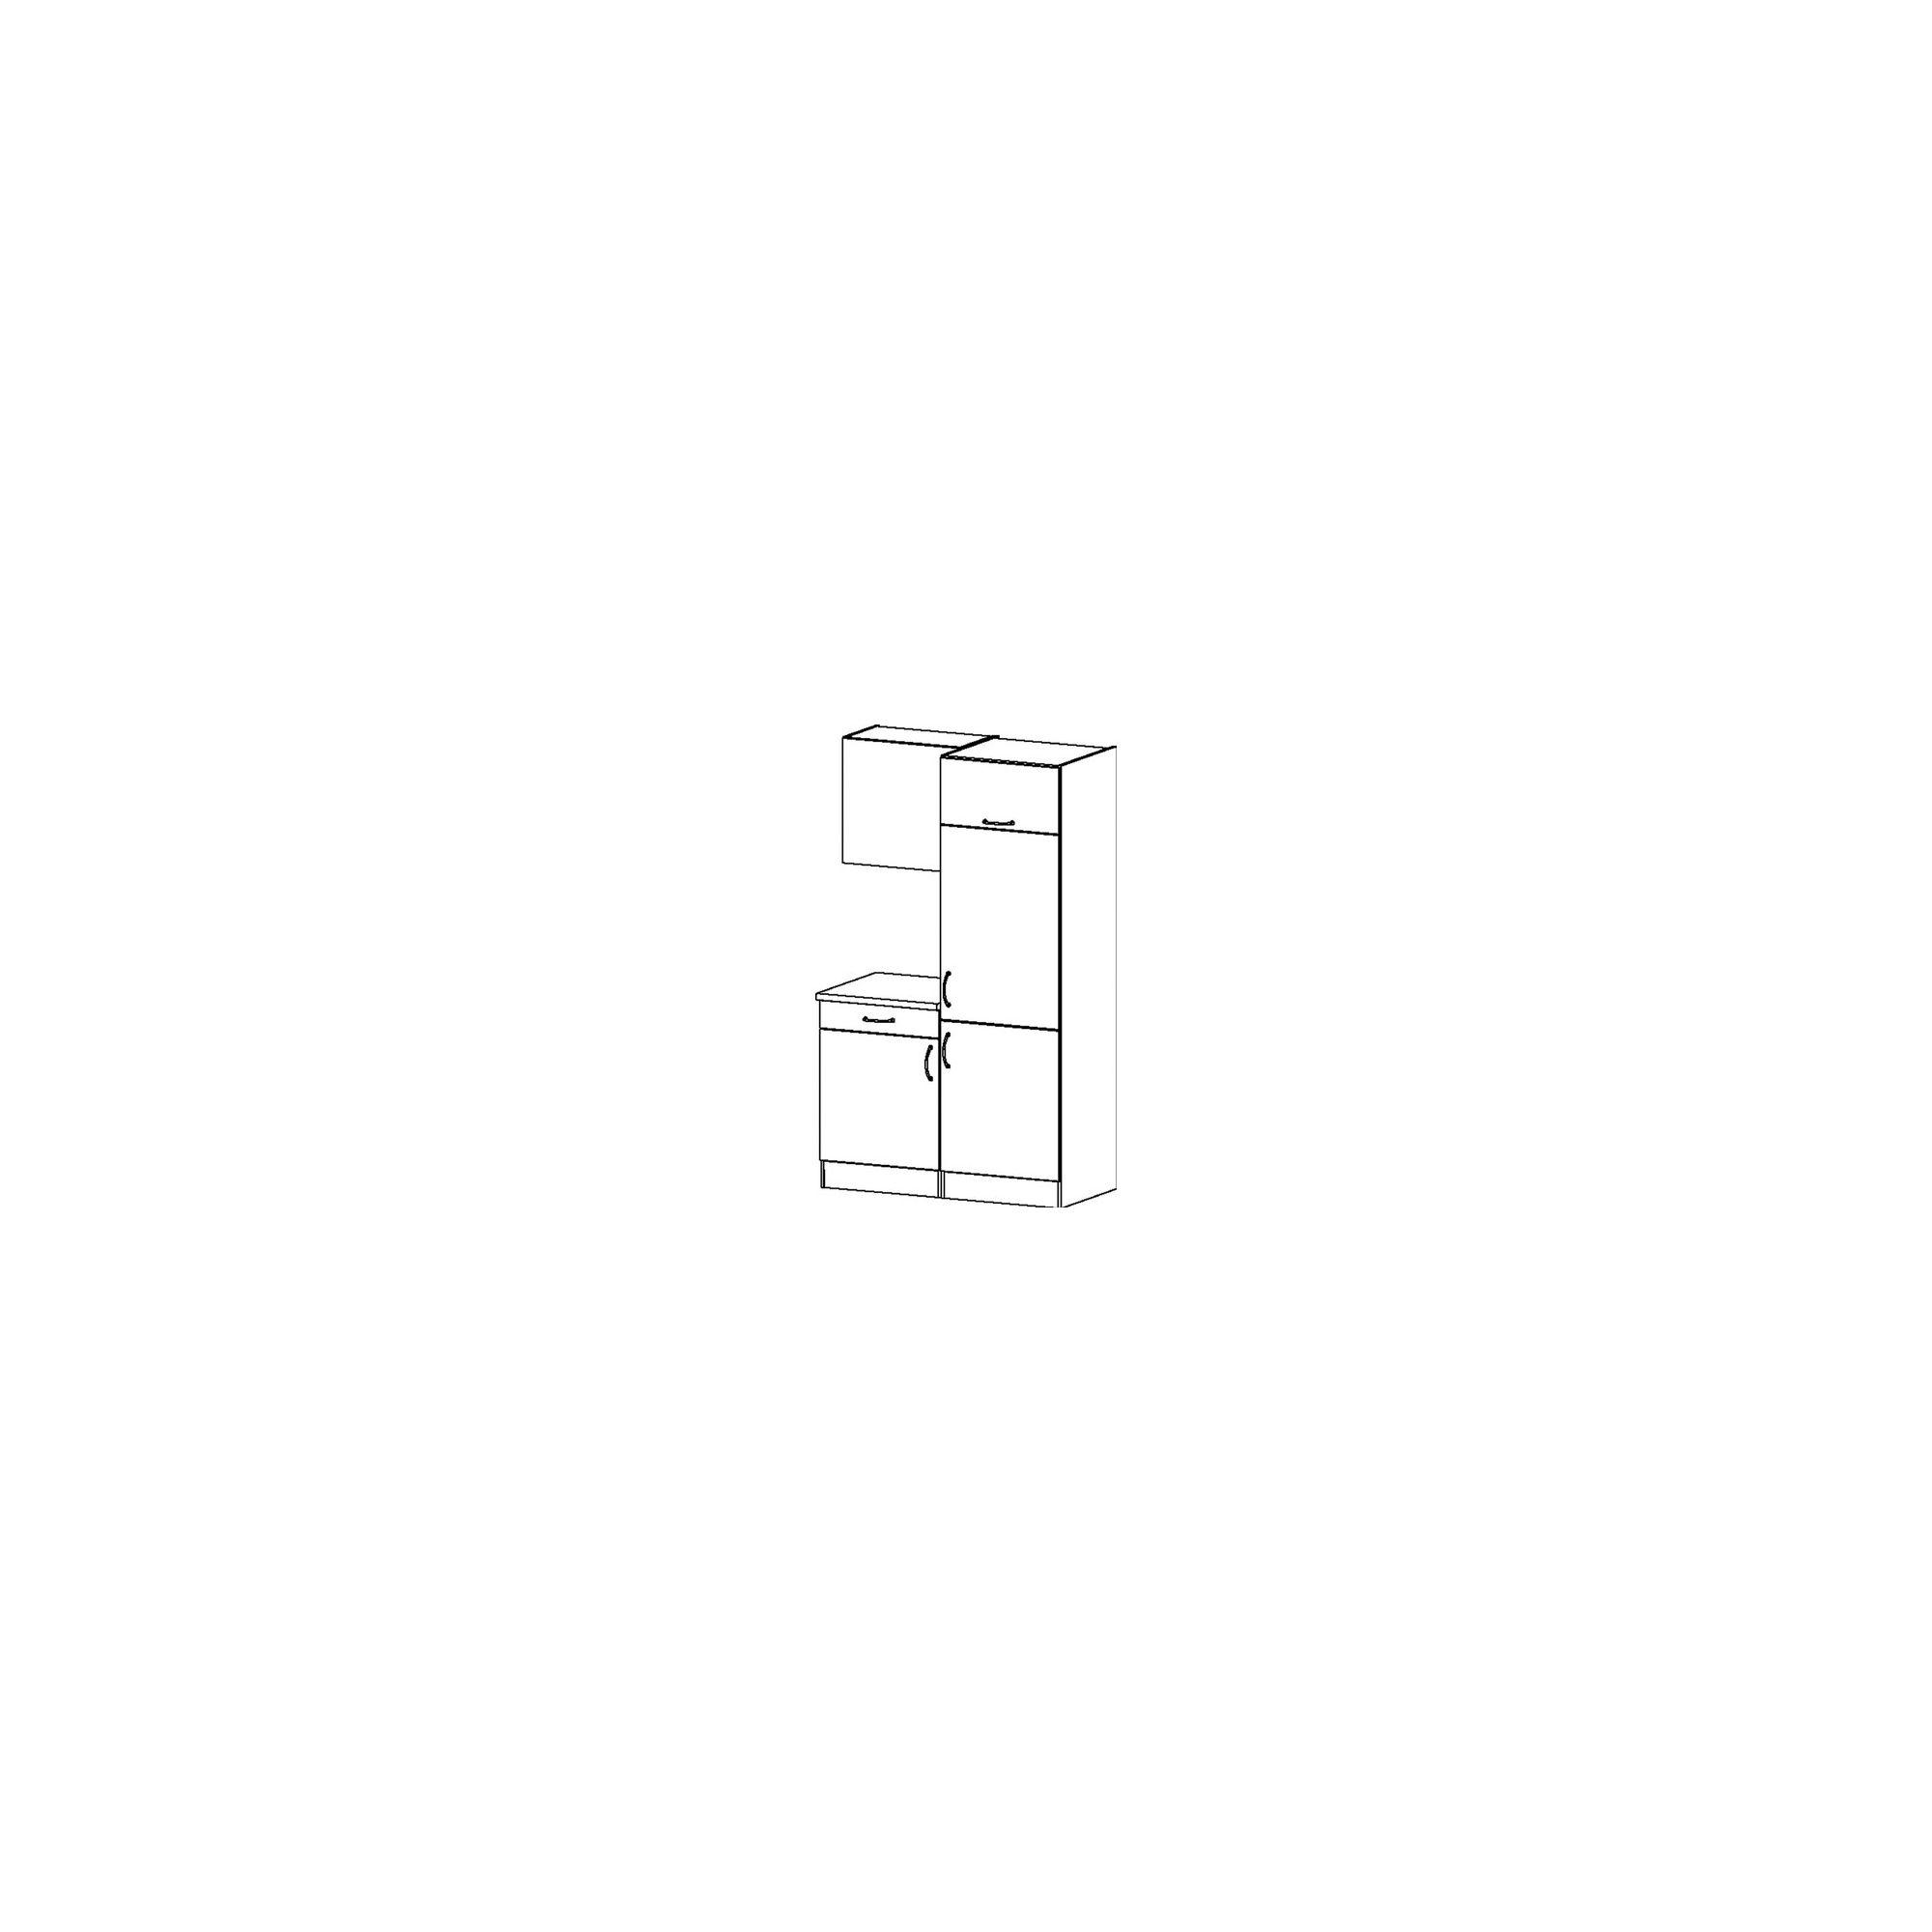 Tvilum Minima Combination 7 - Light Maple at Tesco Direct